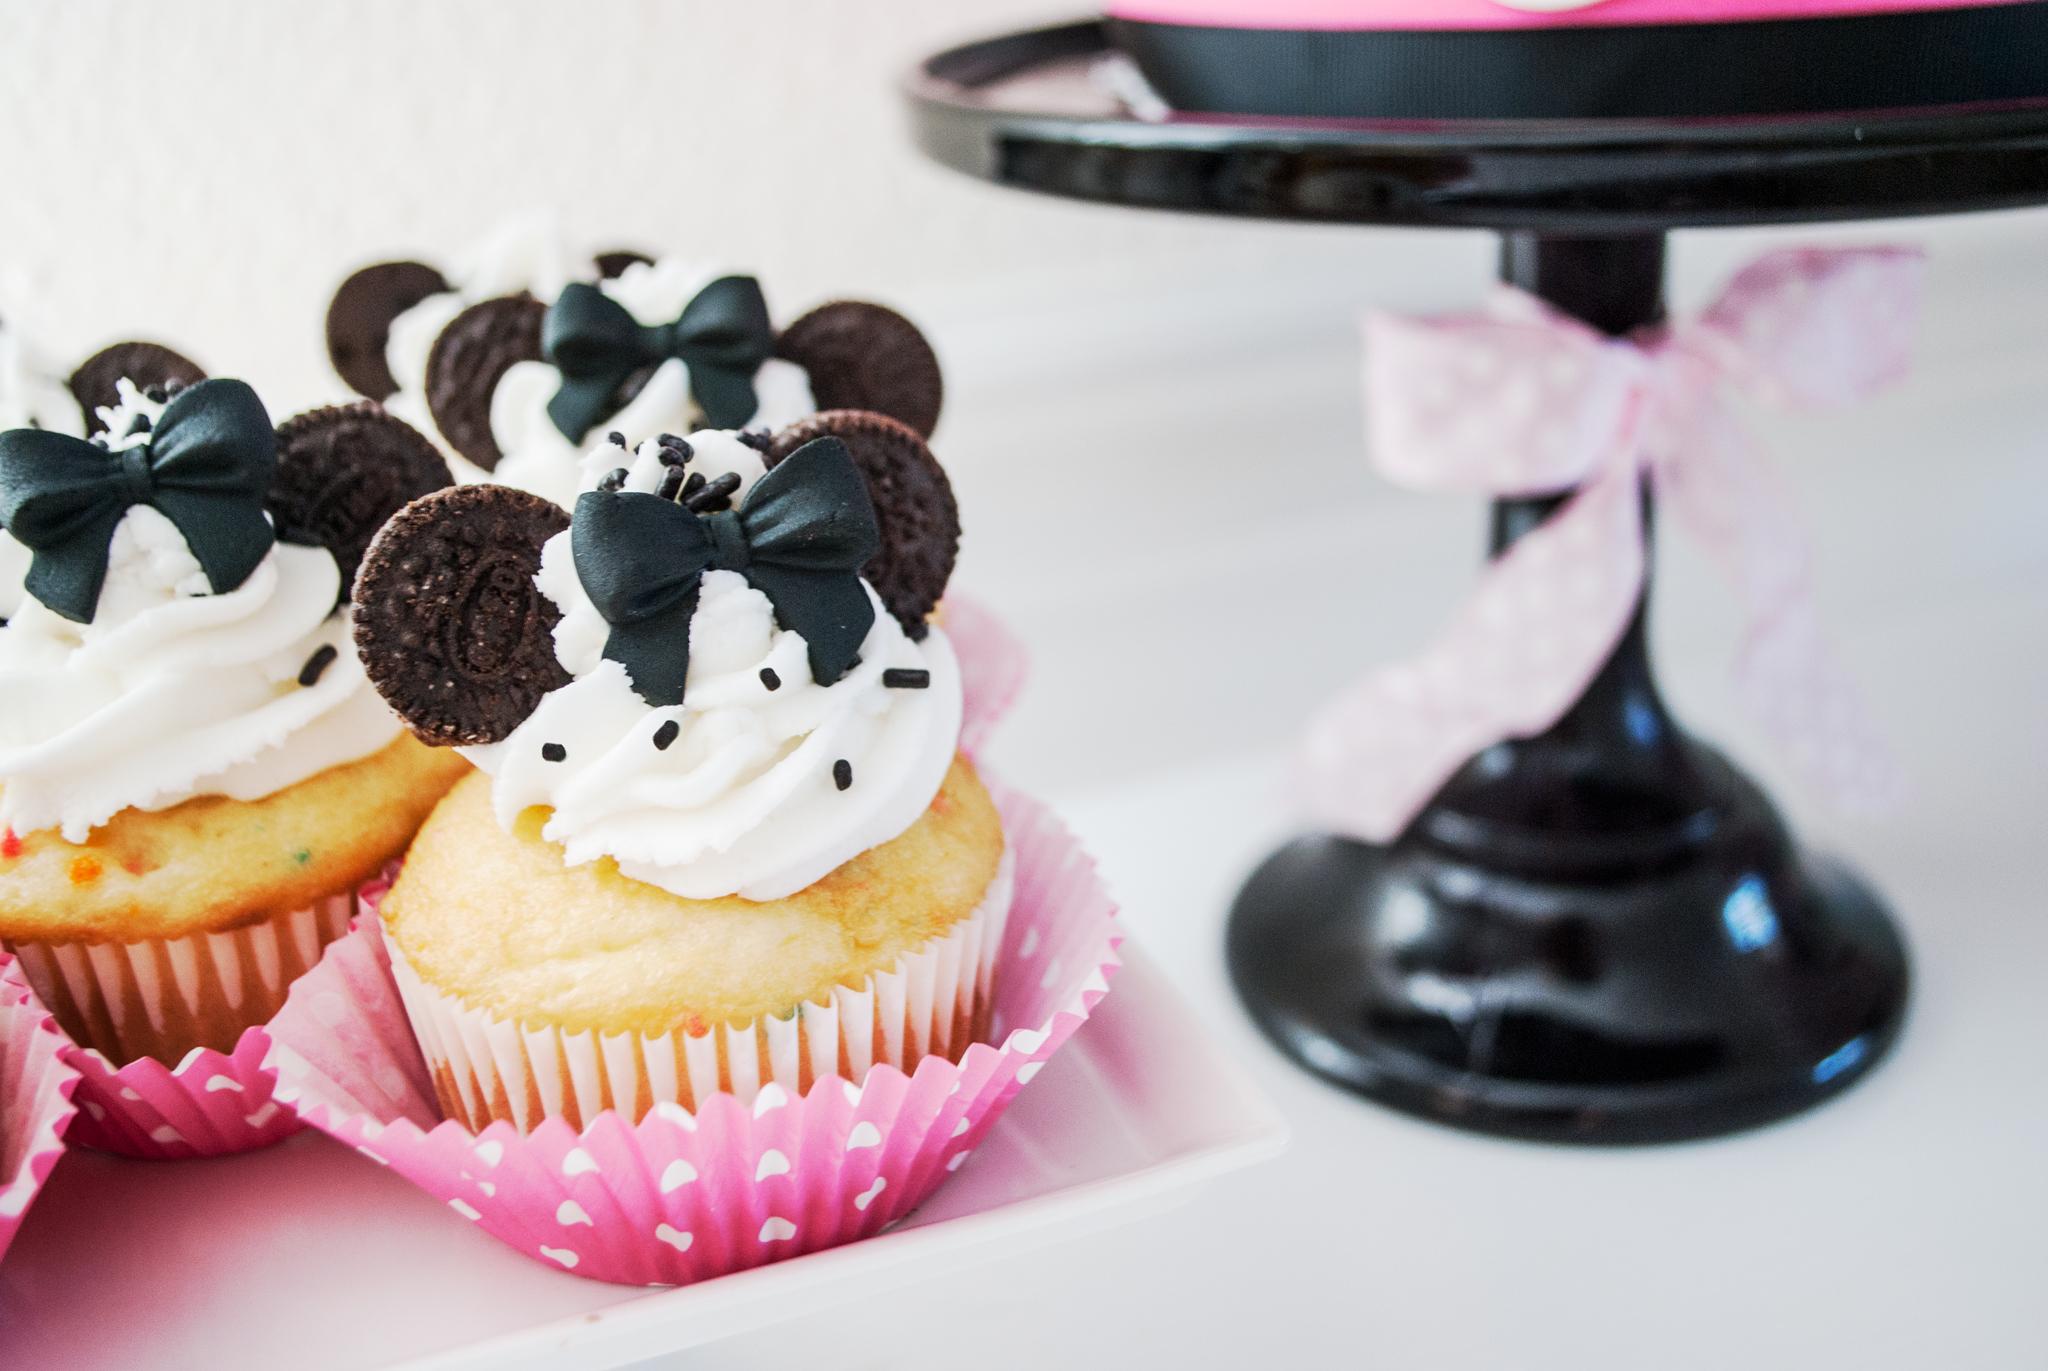 DIY Minnie Mouse Cupcakes